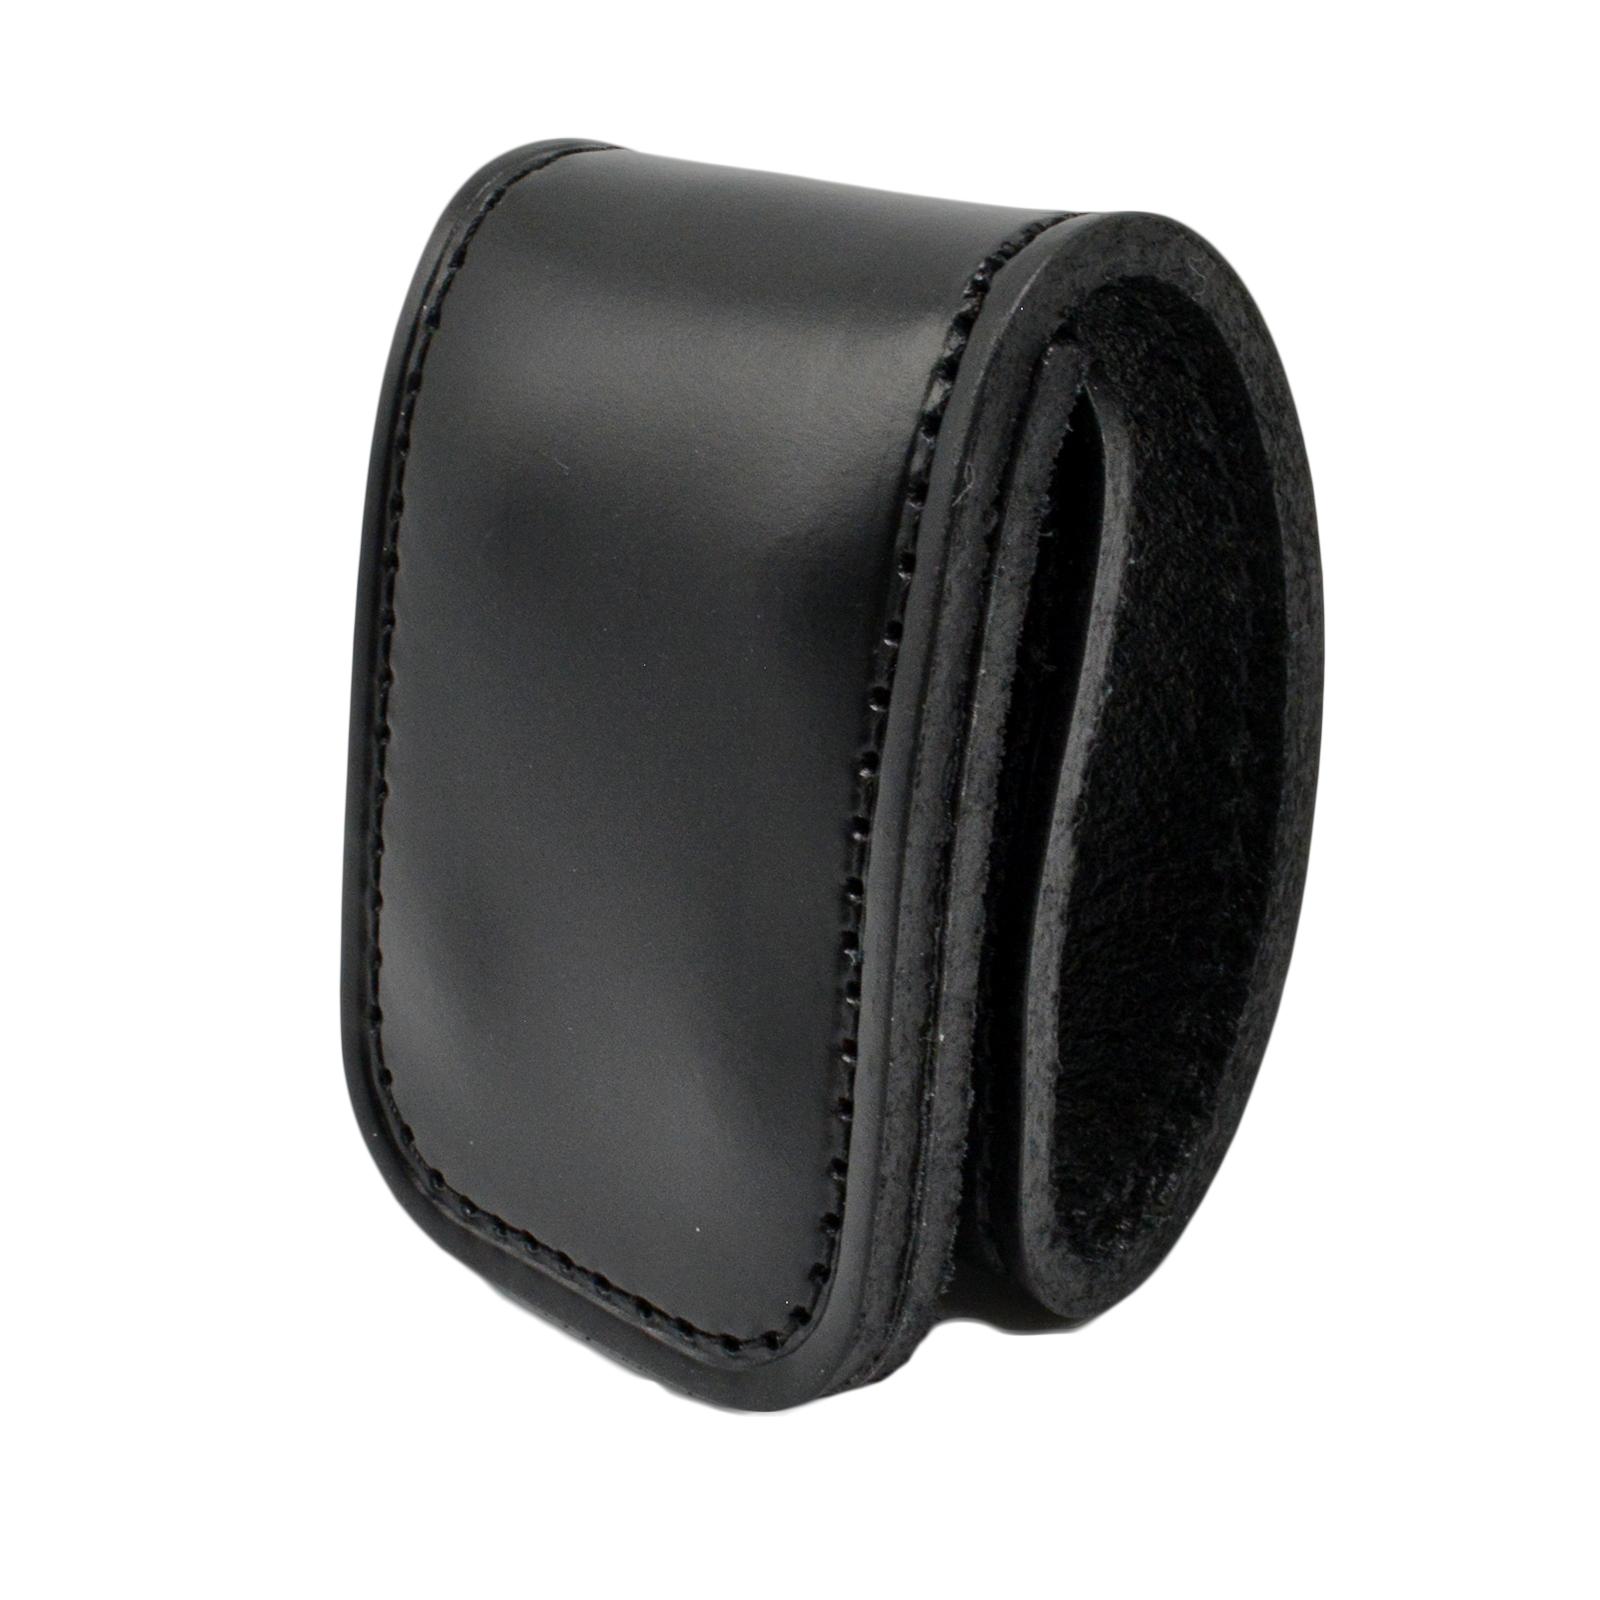 204-double-wide-belt-keeper-hidden-snap-front.jpg